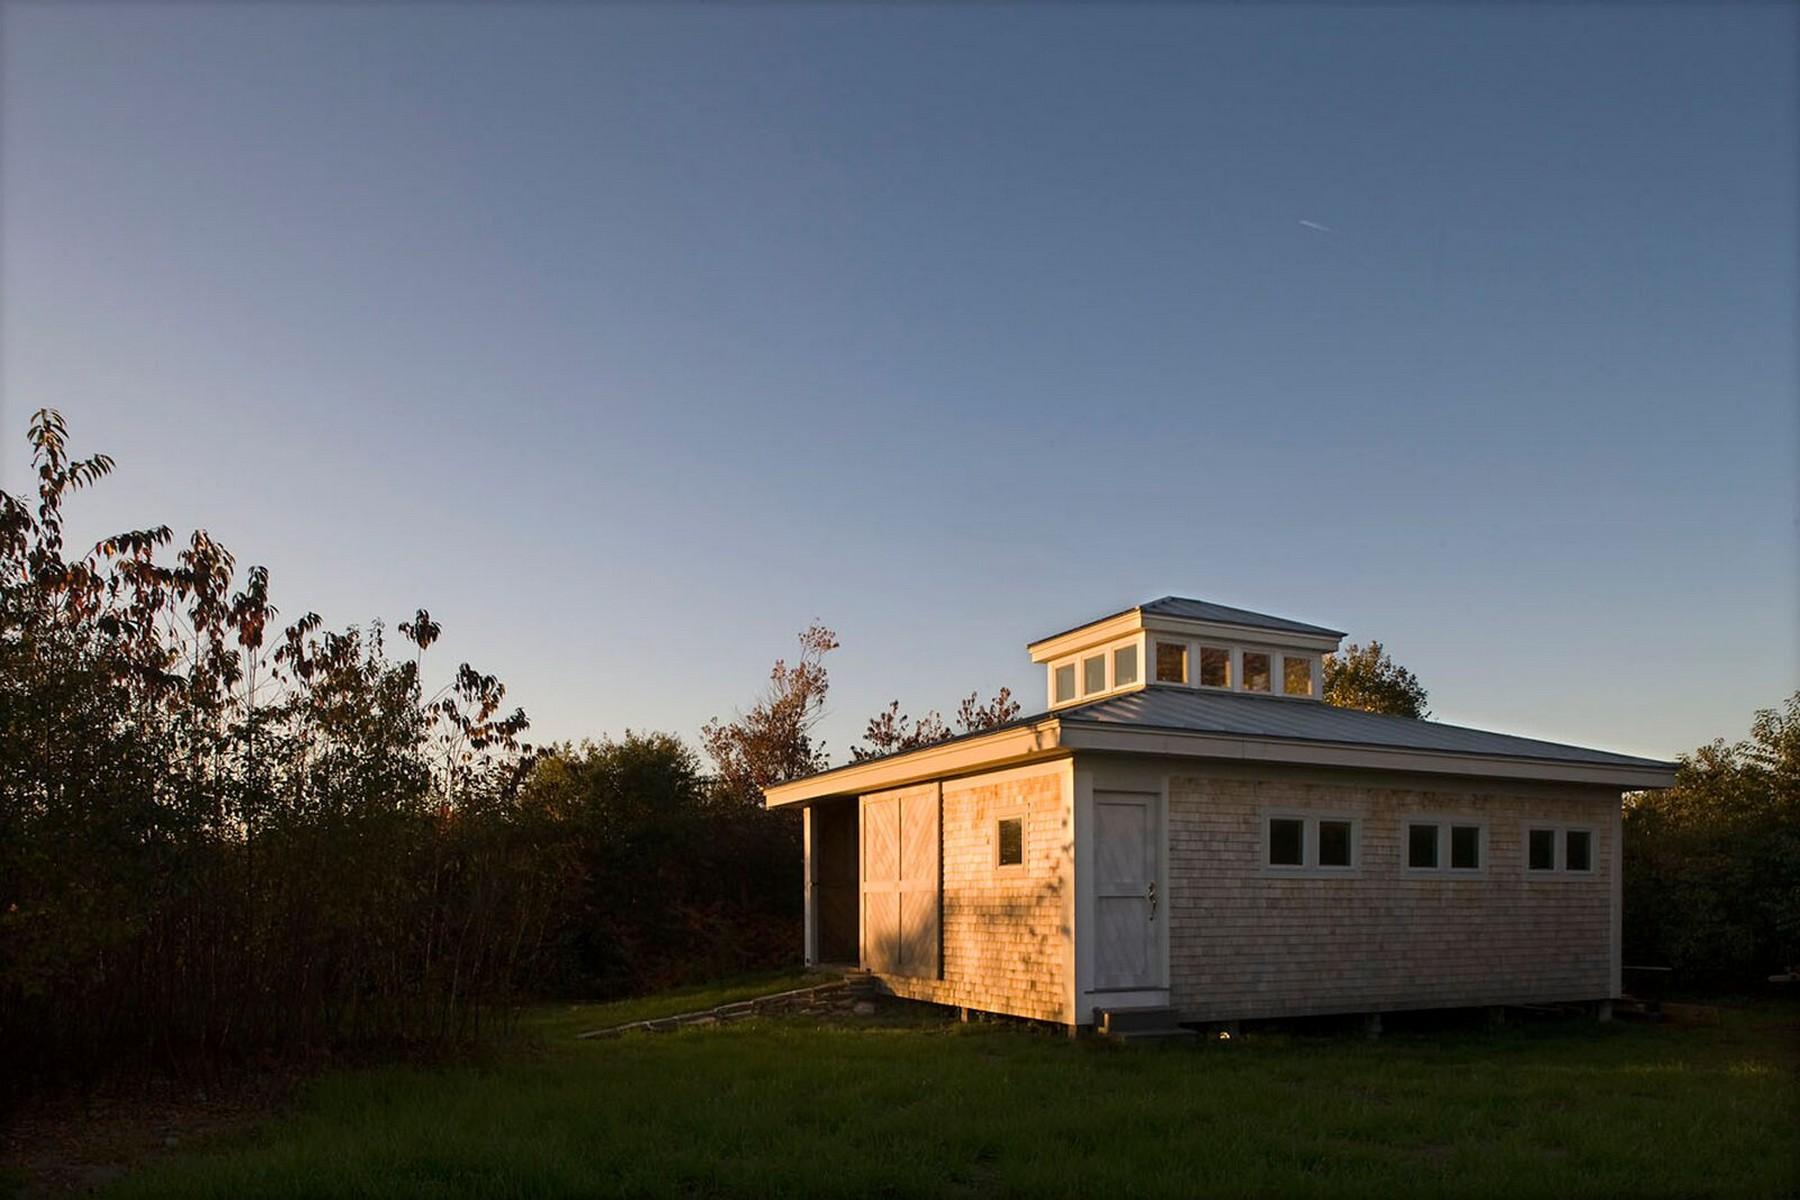 Single Family Home for Sale at Sturdivant Island 3A Sturdivant Island Cumberland, Maine, 04110 United States